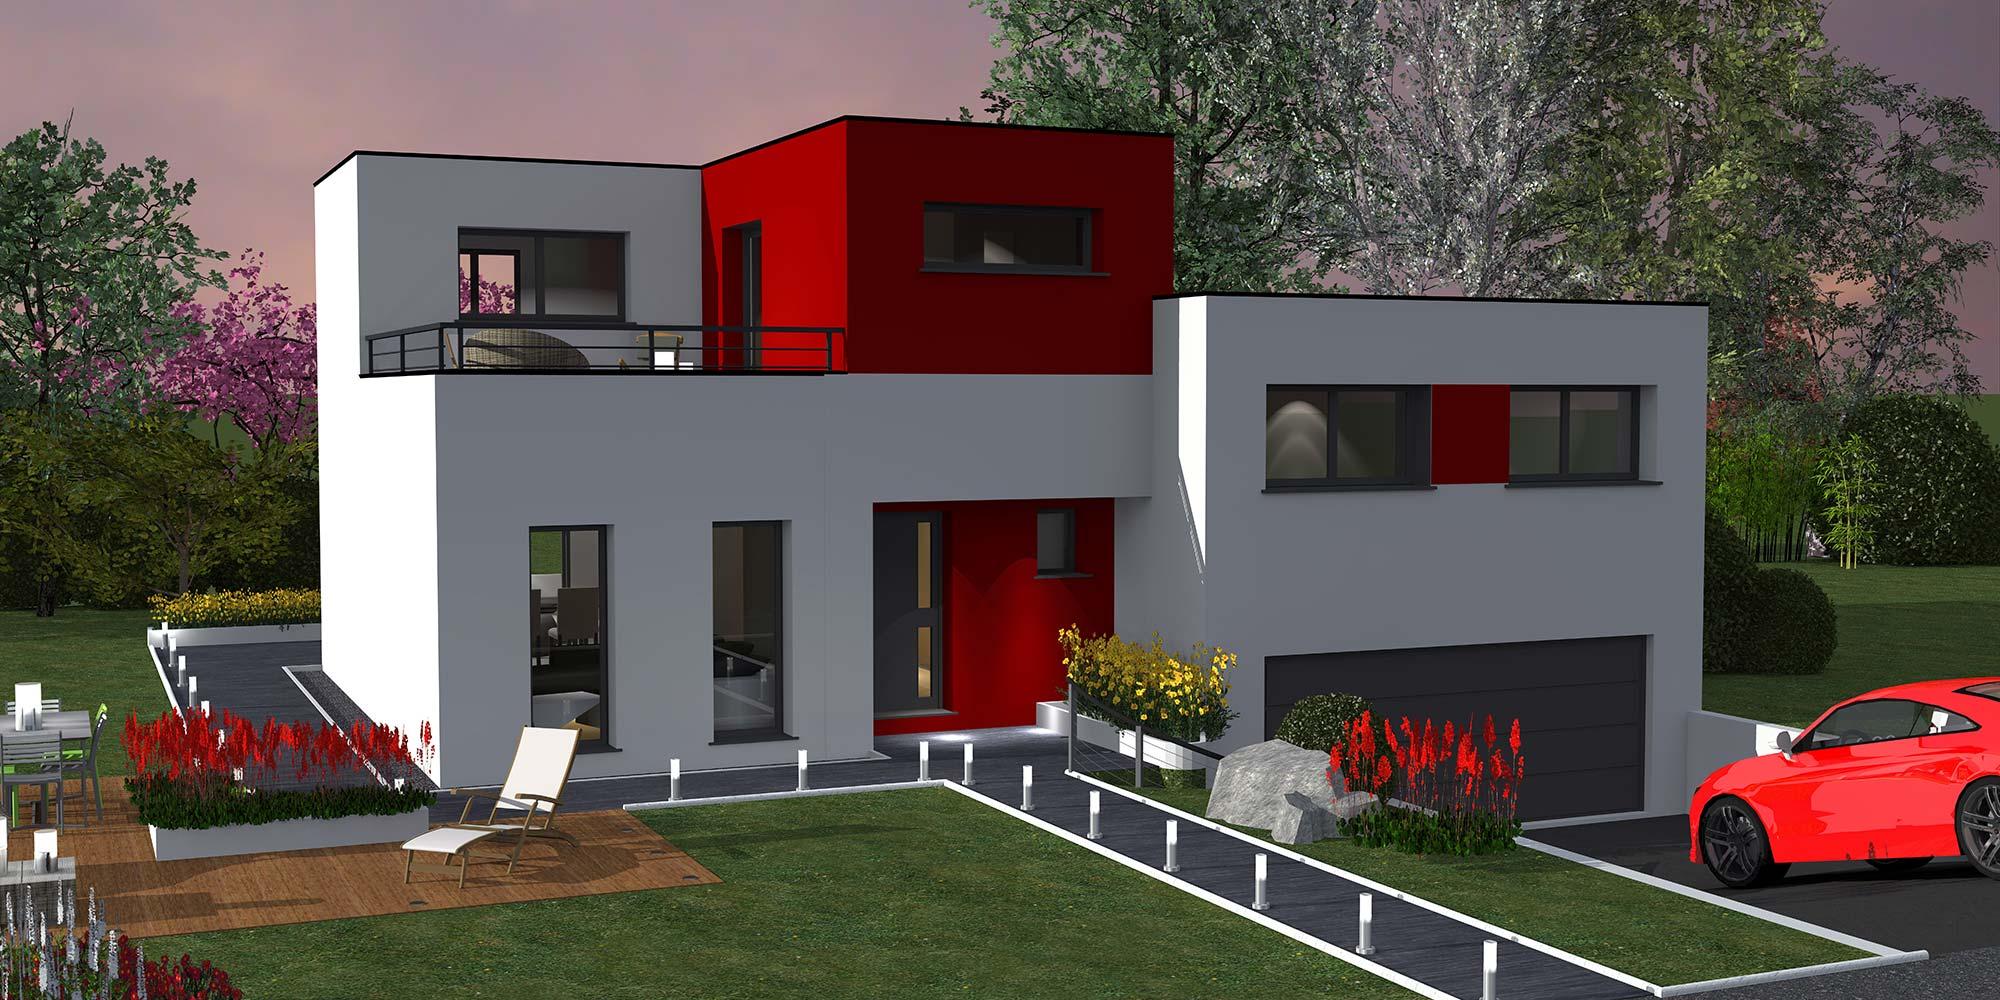 constructeur maison moselle. Black Bedroom Furniture Sets. Home Design Ideas